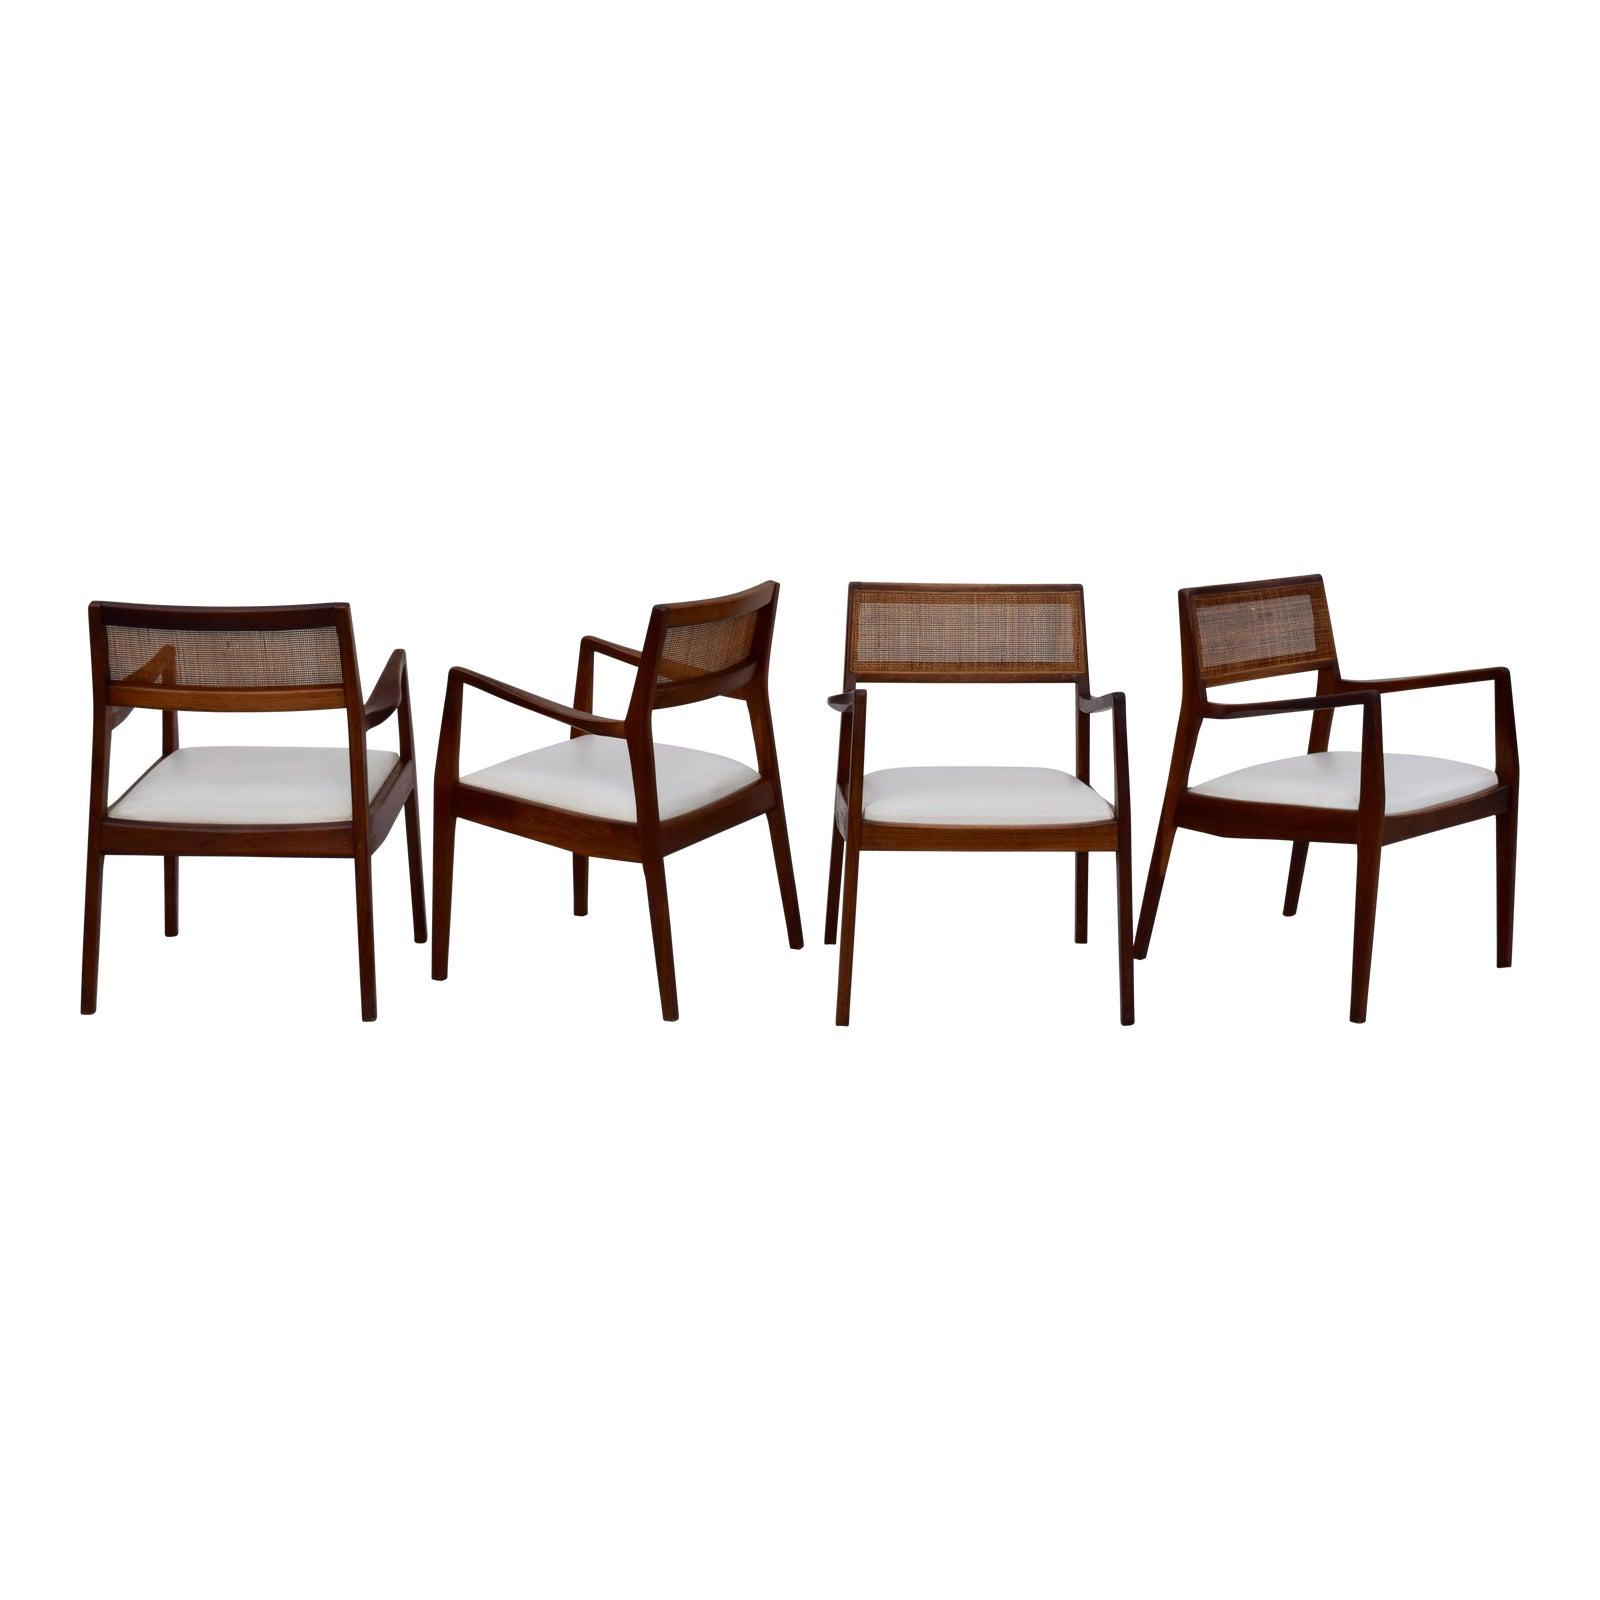 Jens Risom Playboy Dining Chairs - Set of 6 | Chairish